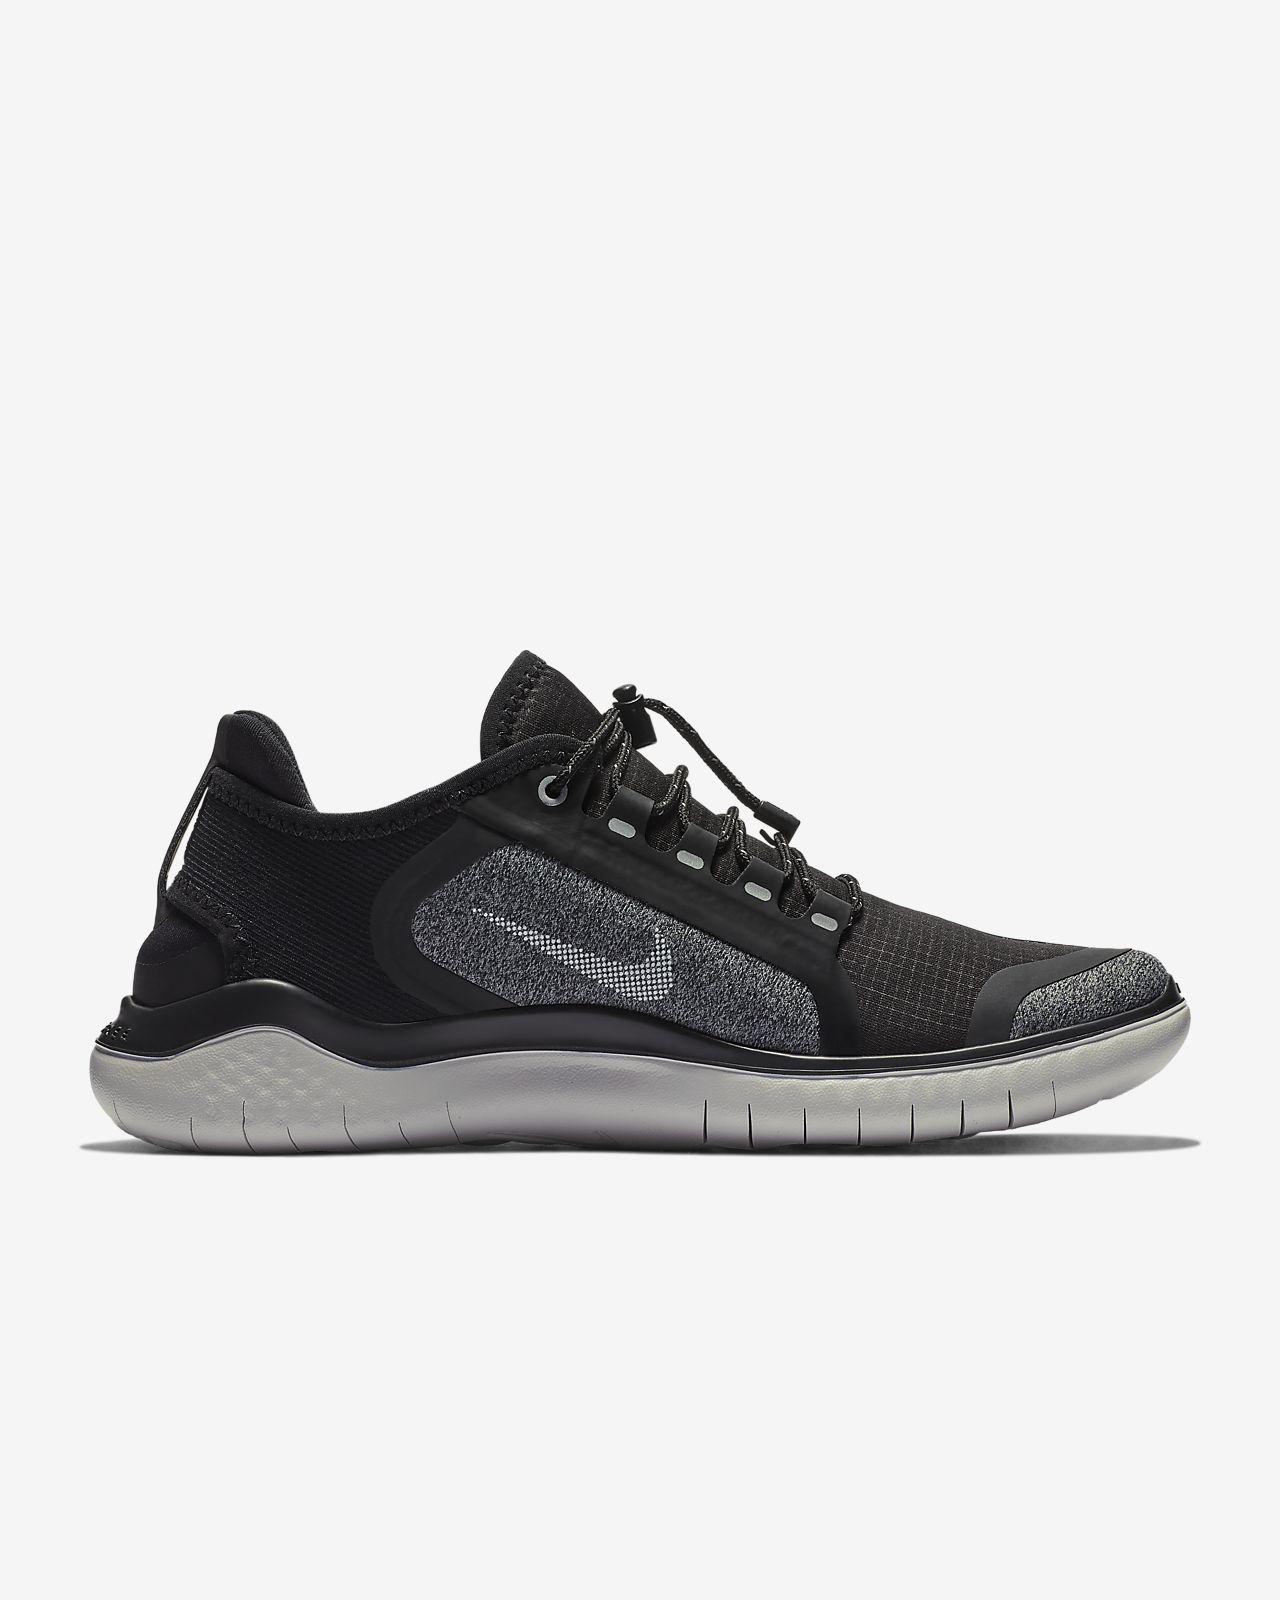 Nike free rn 2019 shield amazon